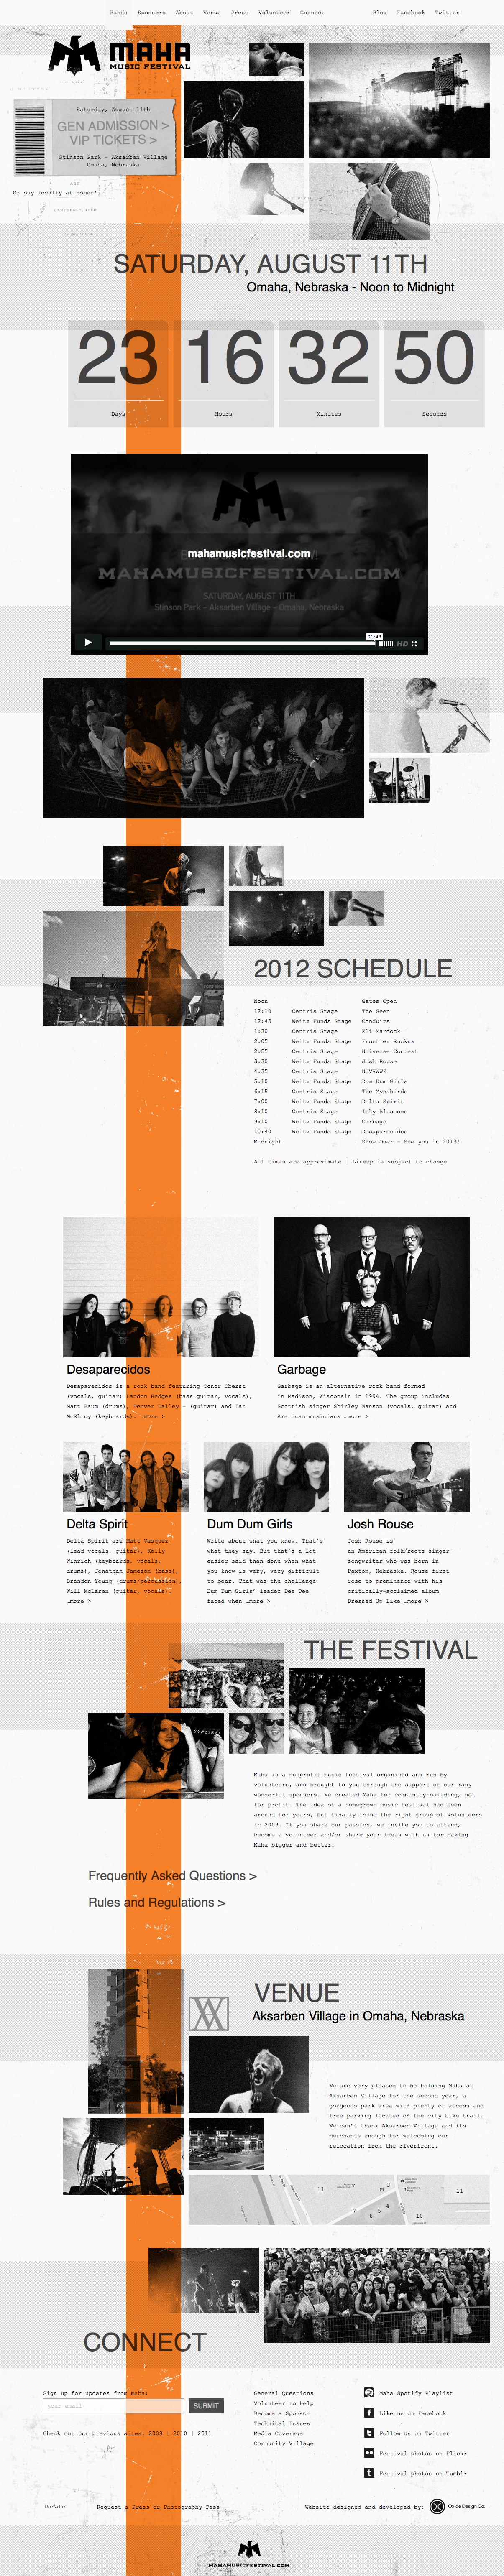 Maha Music Fest website